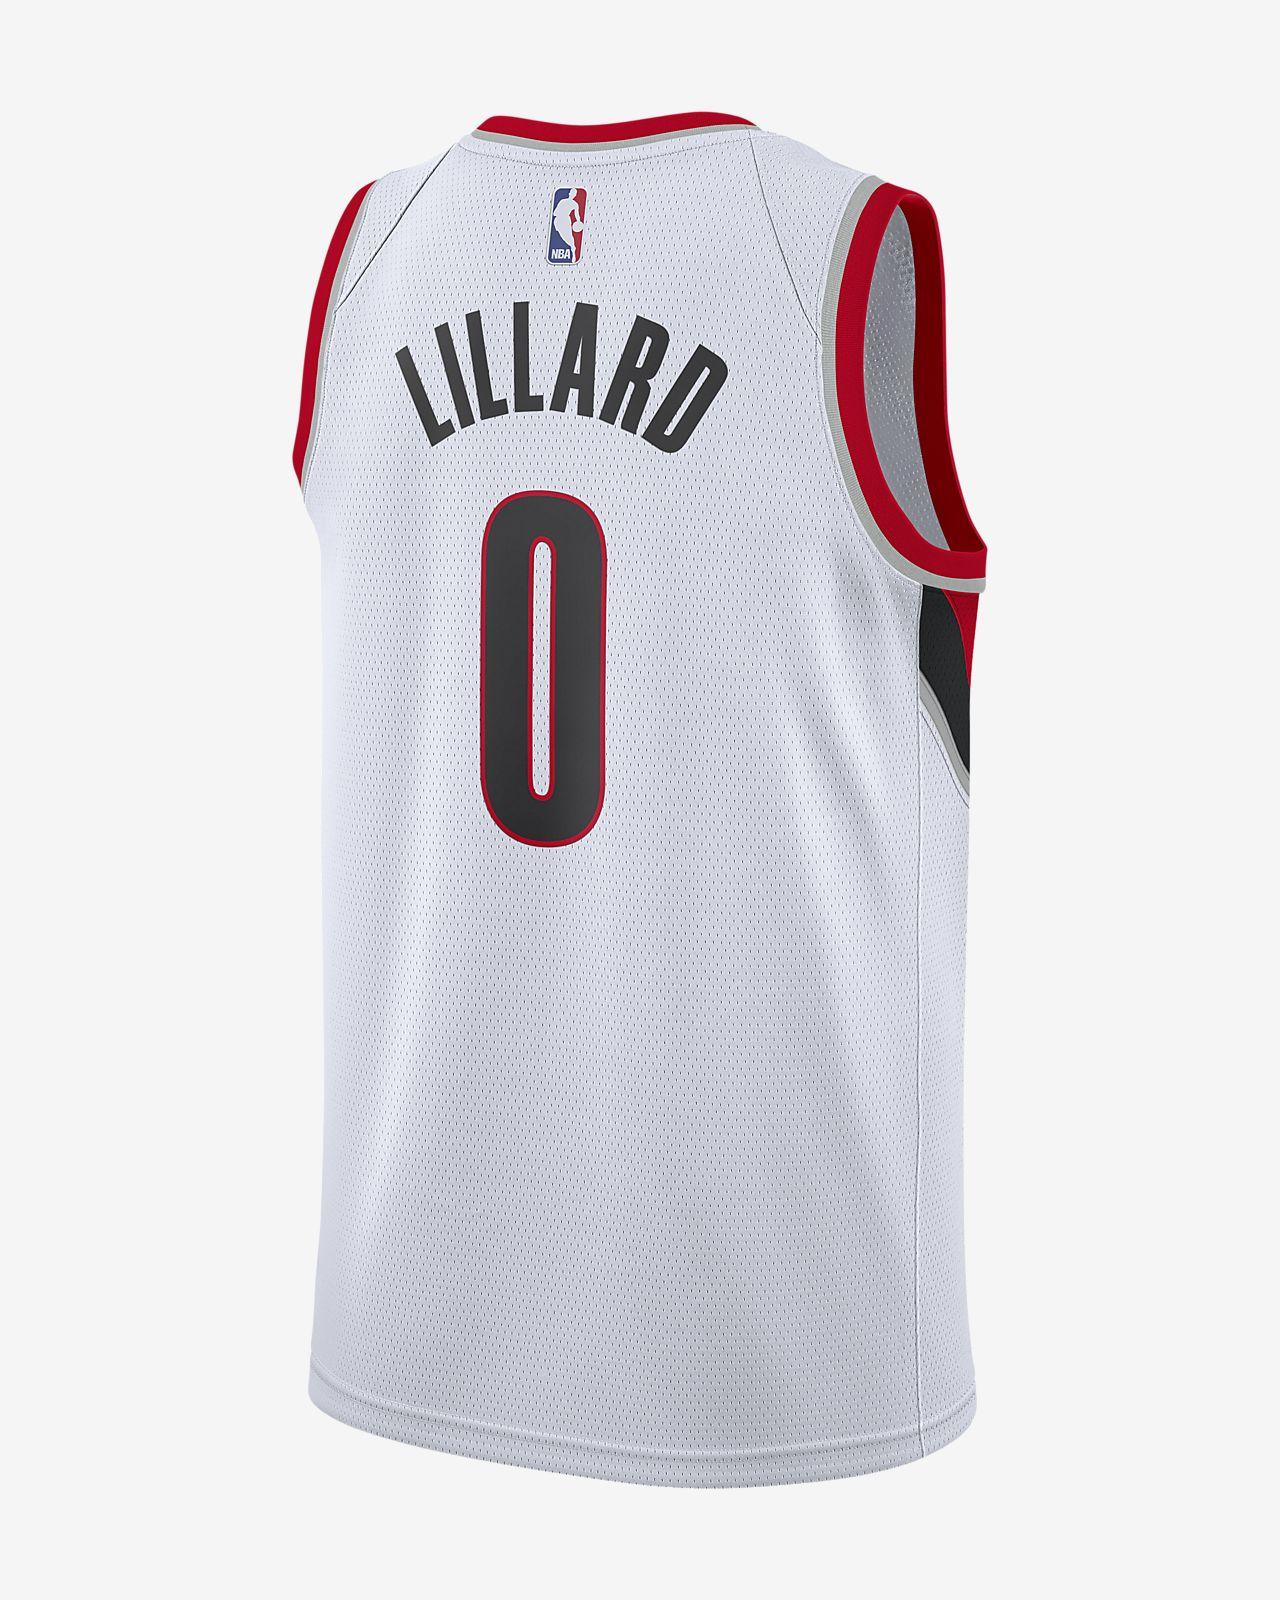 41da85d4226 ... 波特兰开拓者队(Damian Lillard) Association Edition Swingman Jersey Nike NBA